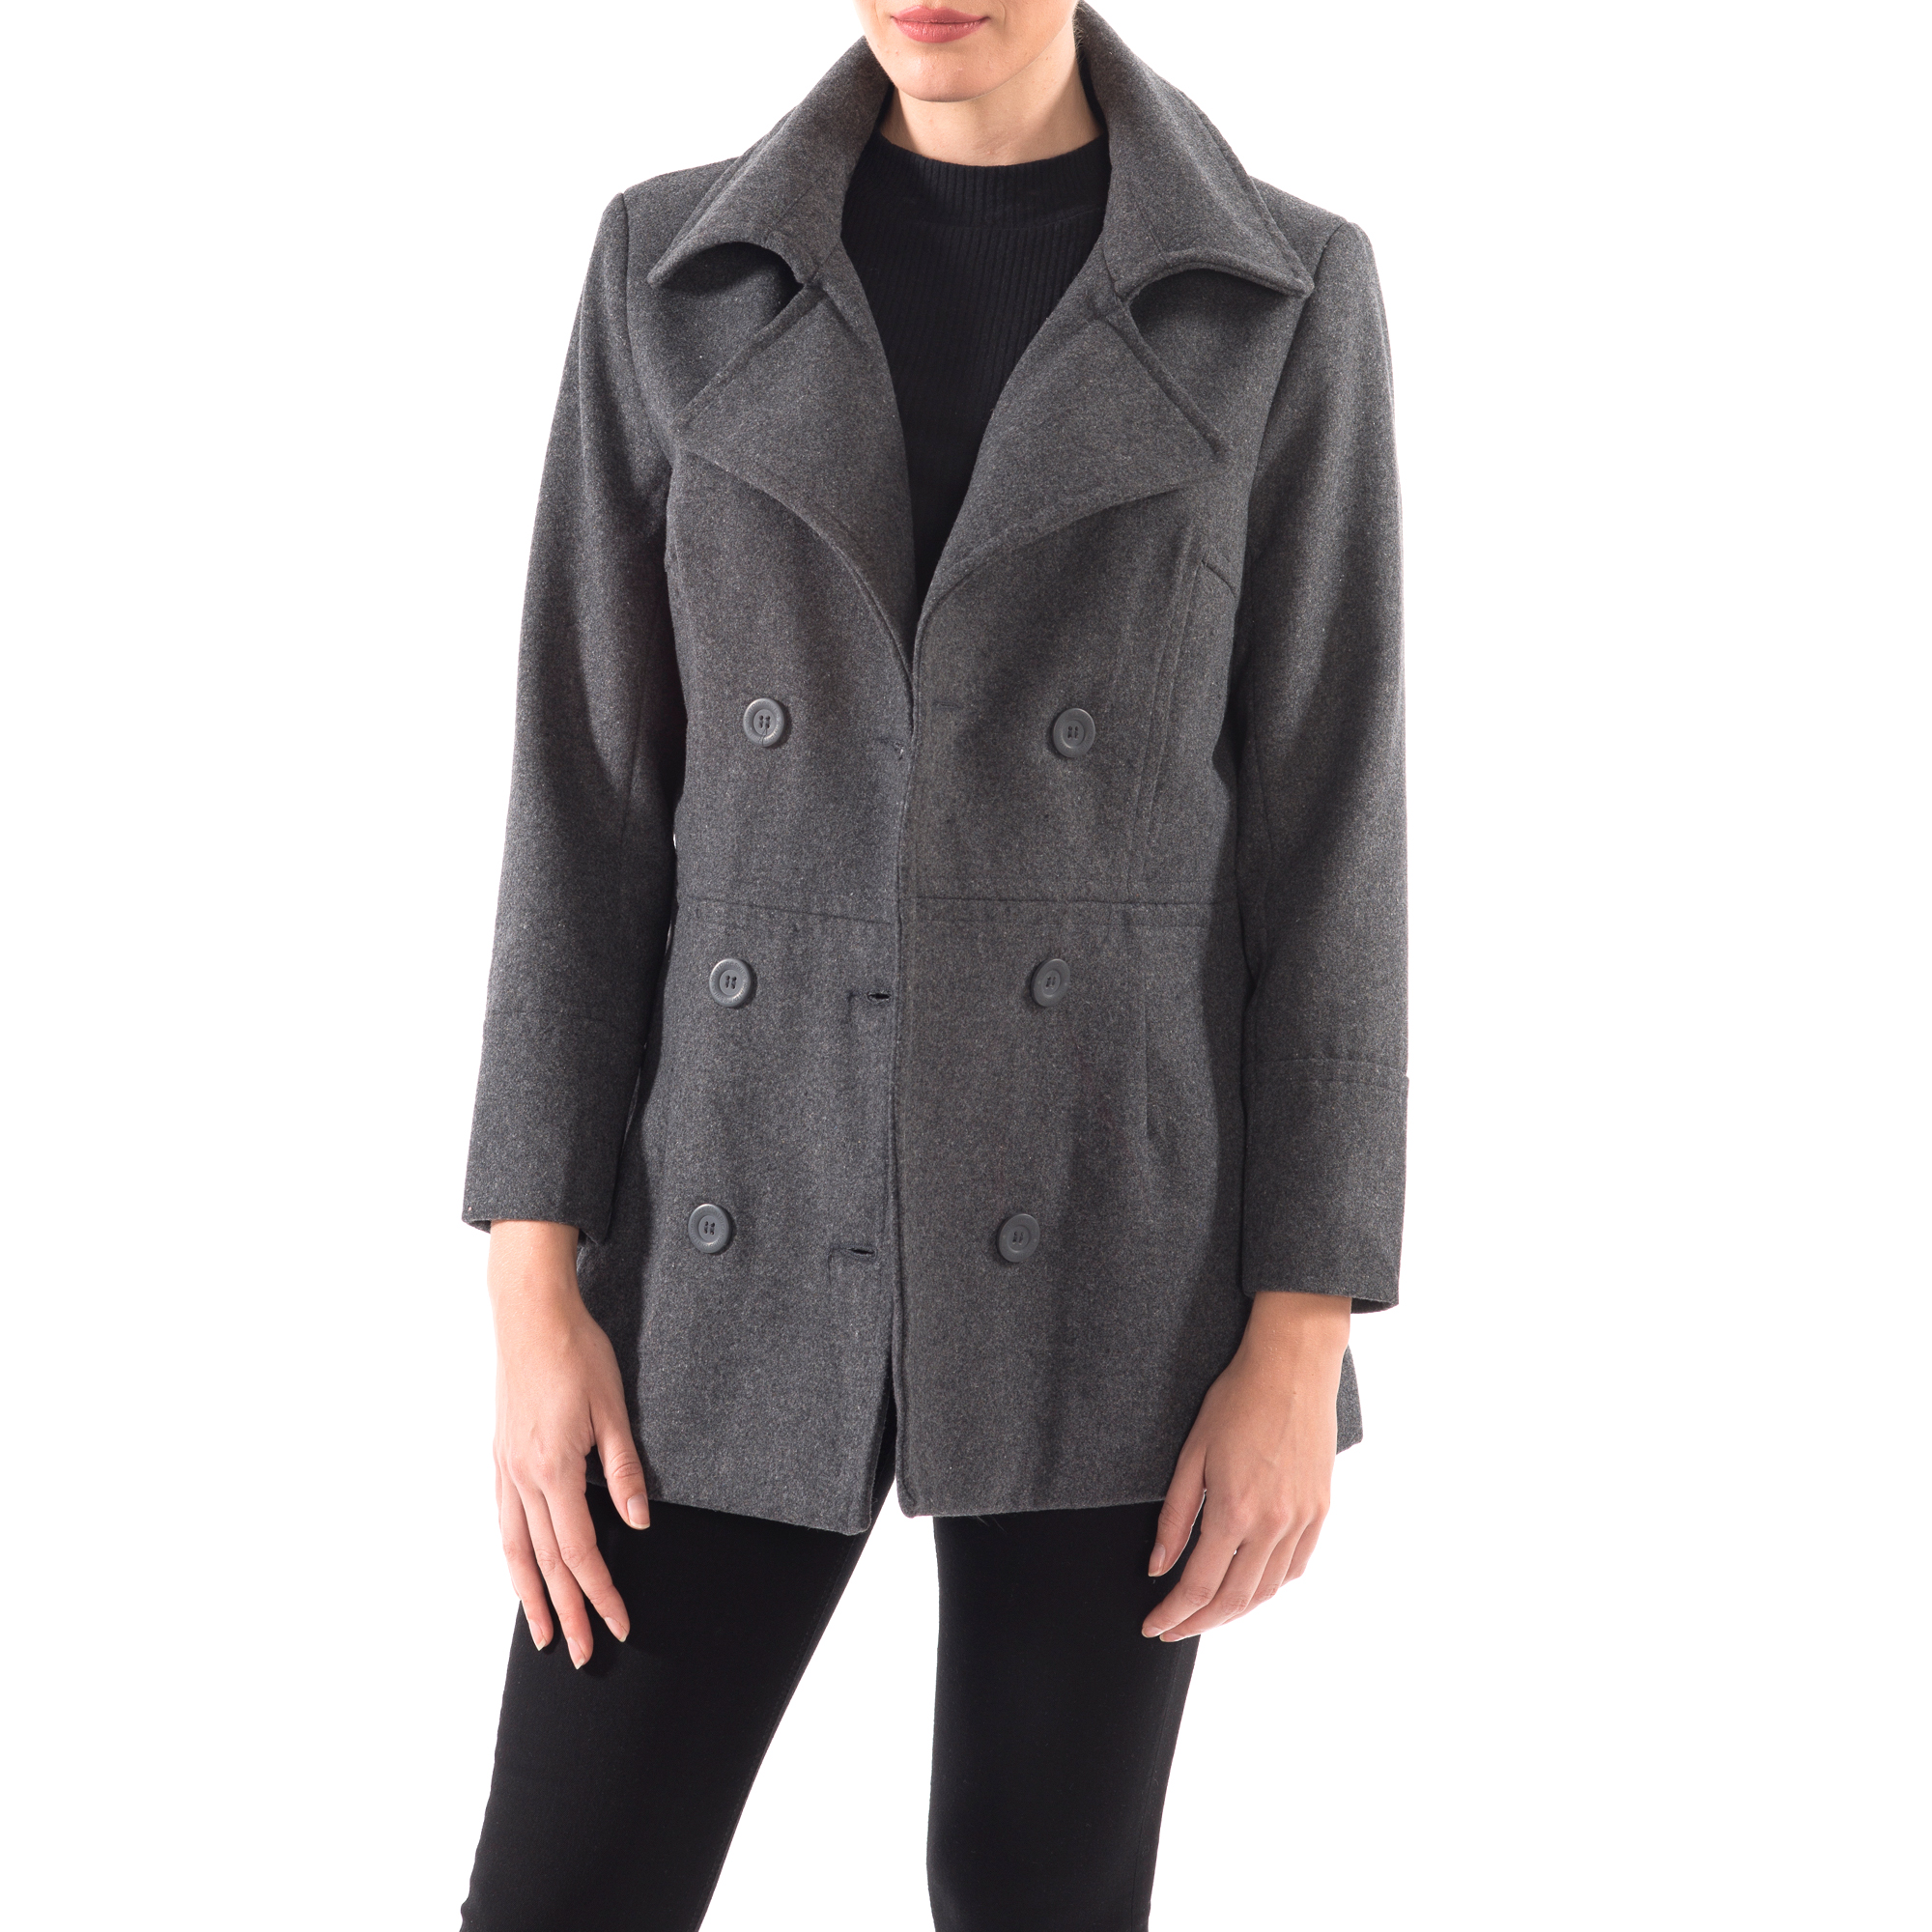 Alpine-Swiss-Emma-Womens-Peacoat-Jacket-Wool-Blazer-Double-Breasted-Overcoat-New thumbnail 42